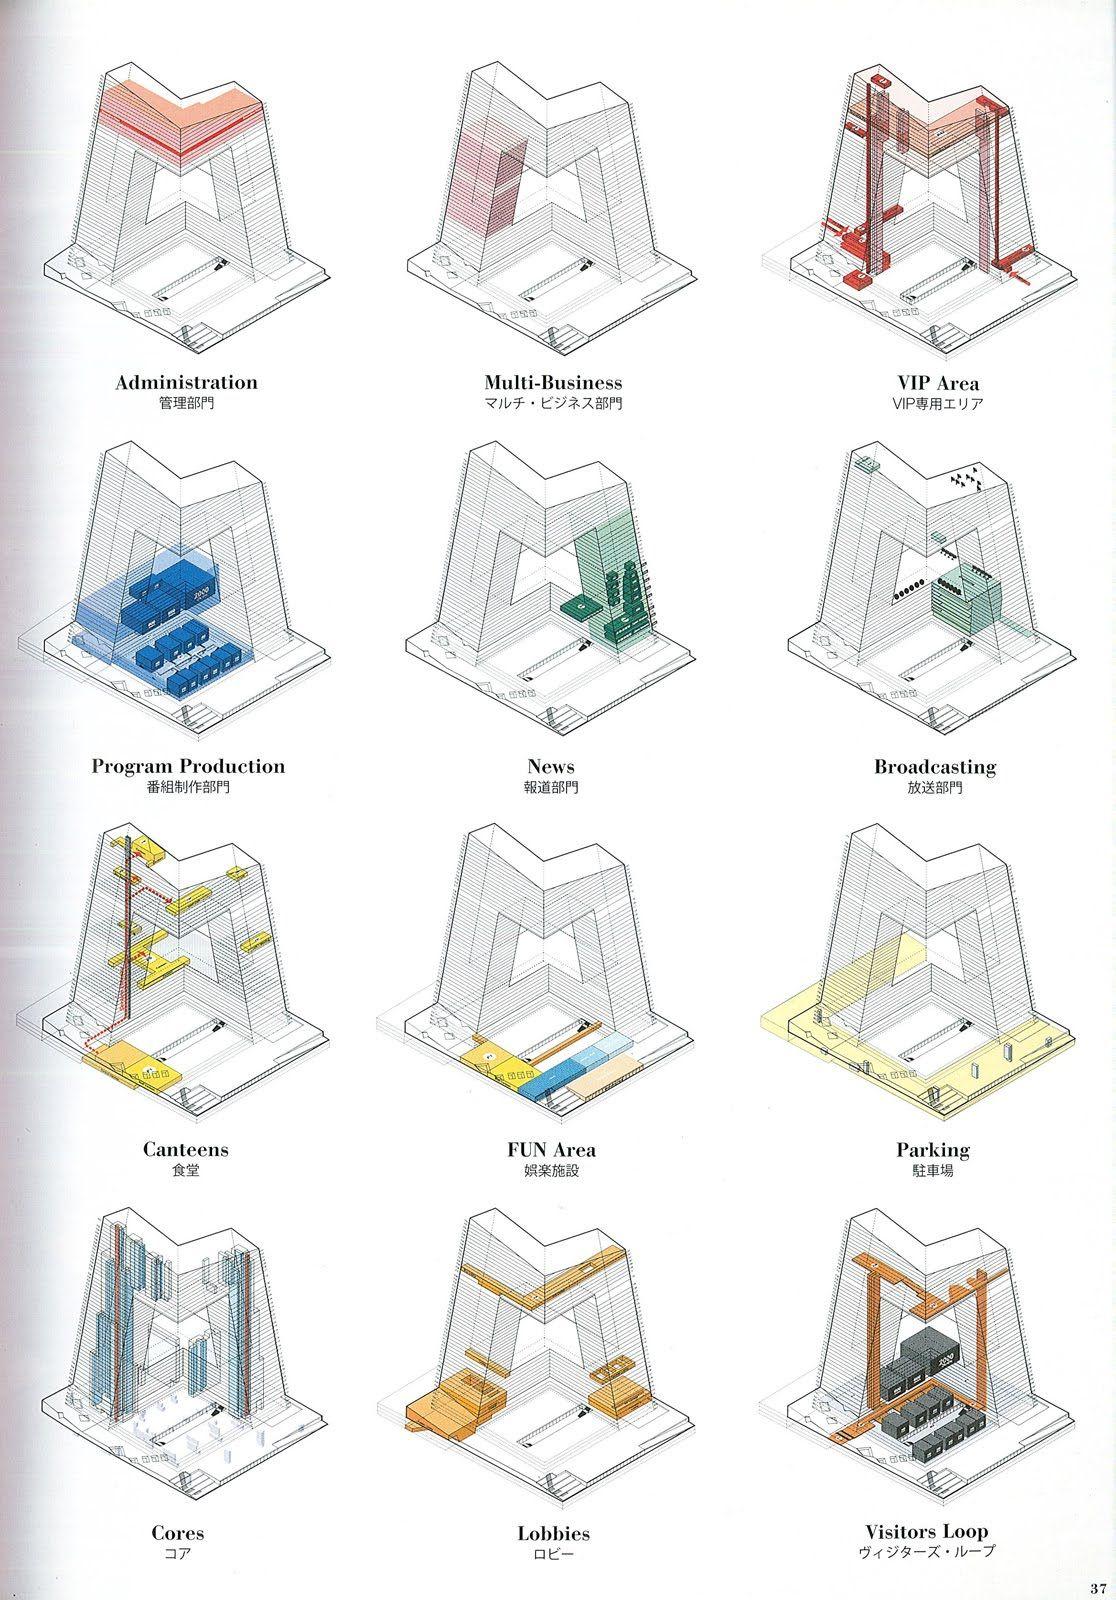 Oma ccn tower wayfinding program diagrams diagram oma ccn tower wayfinding program diagrams pooptronica Choice Image